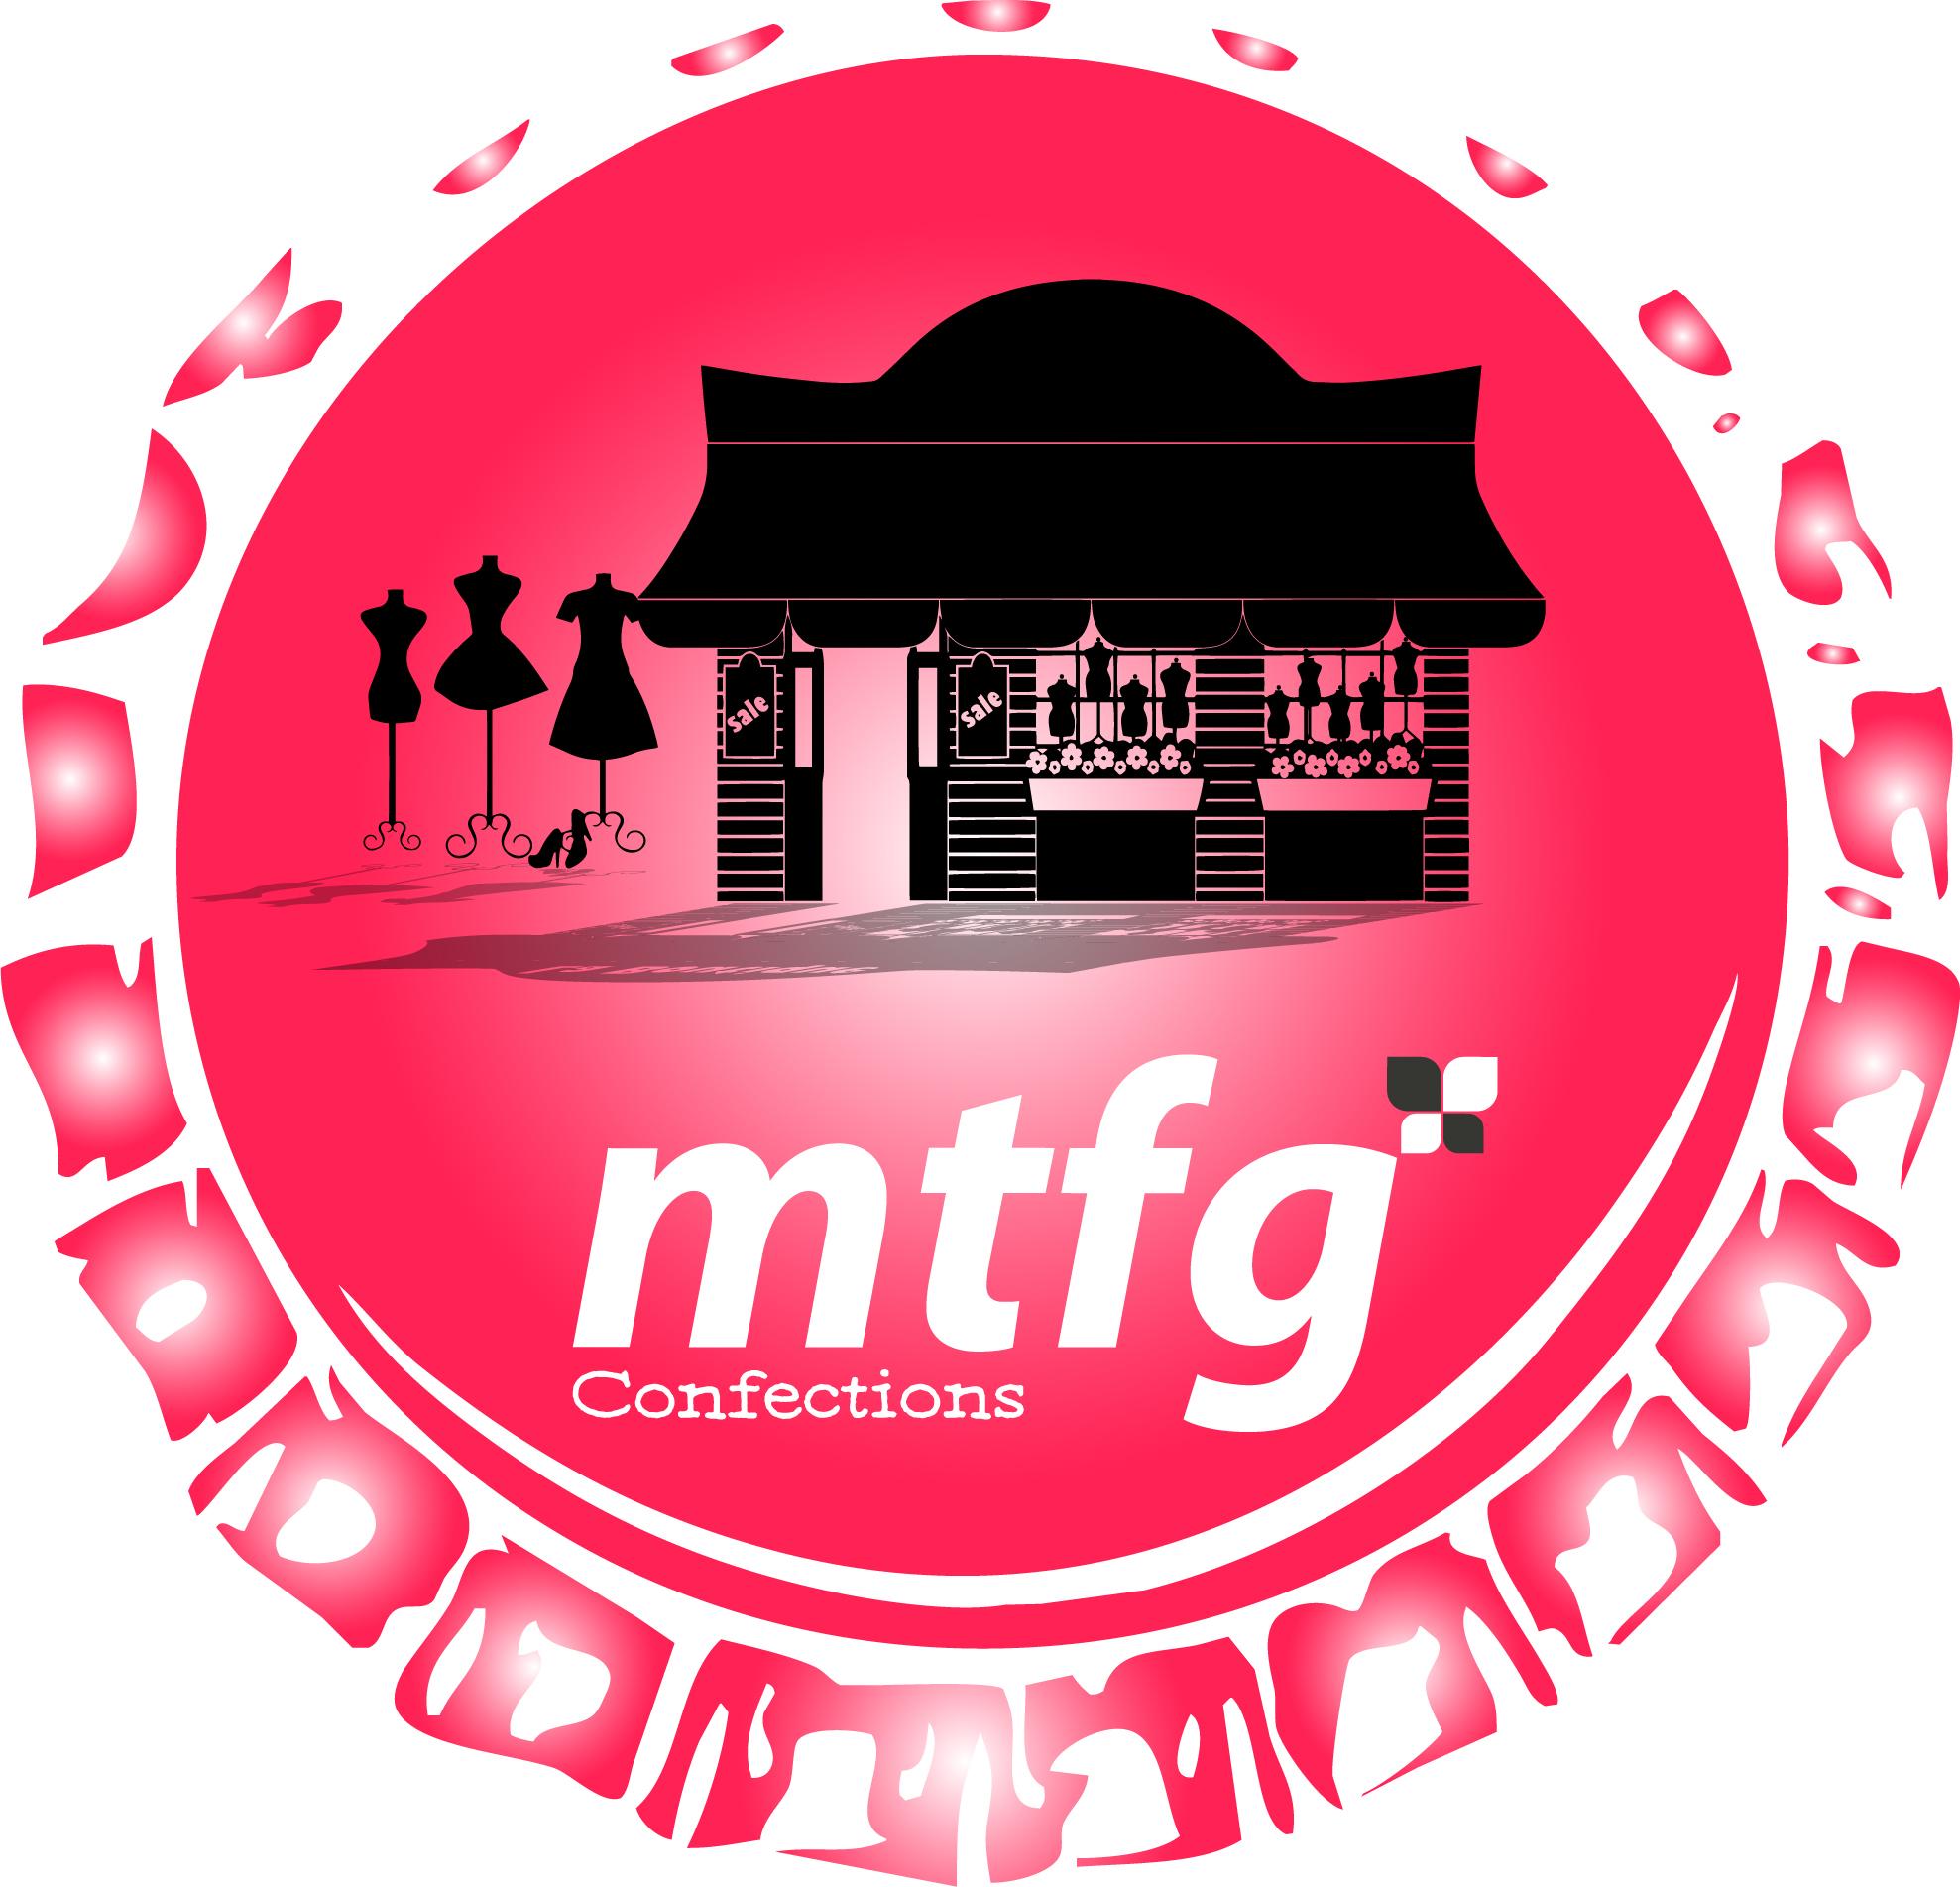 MTFG Confections